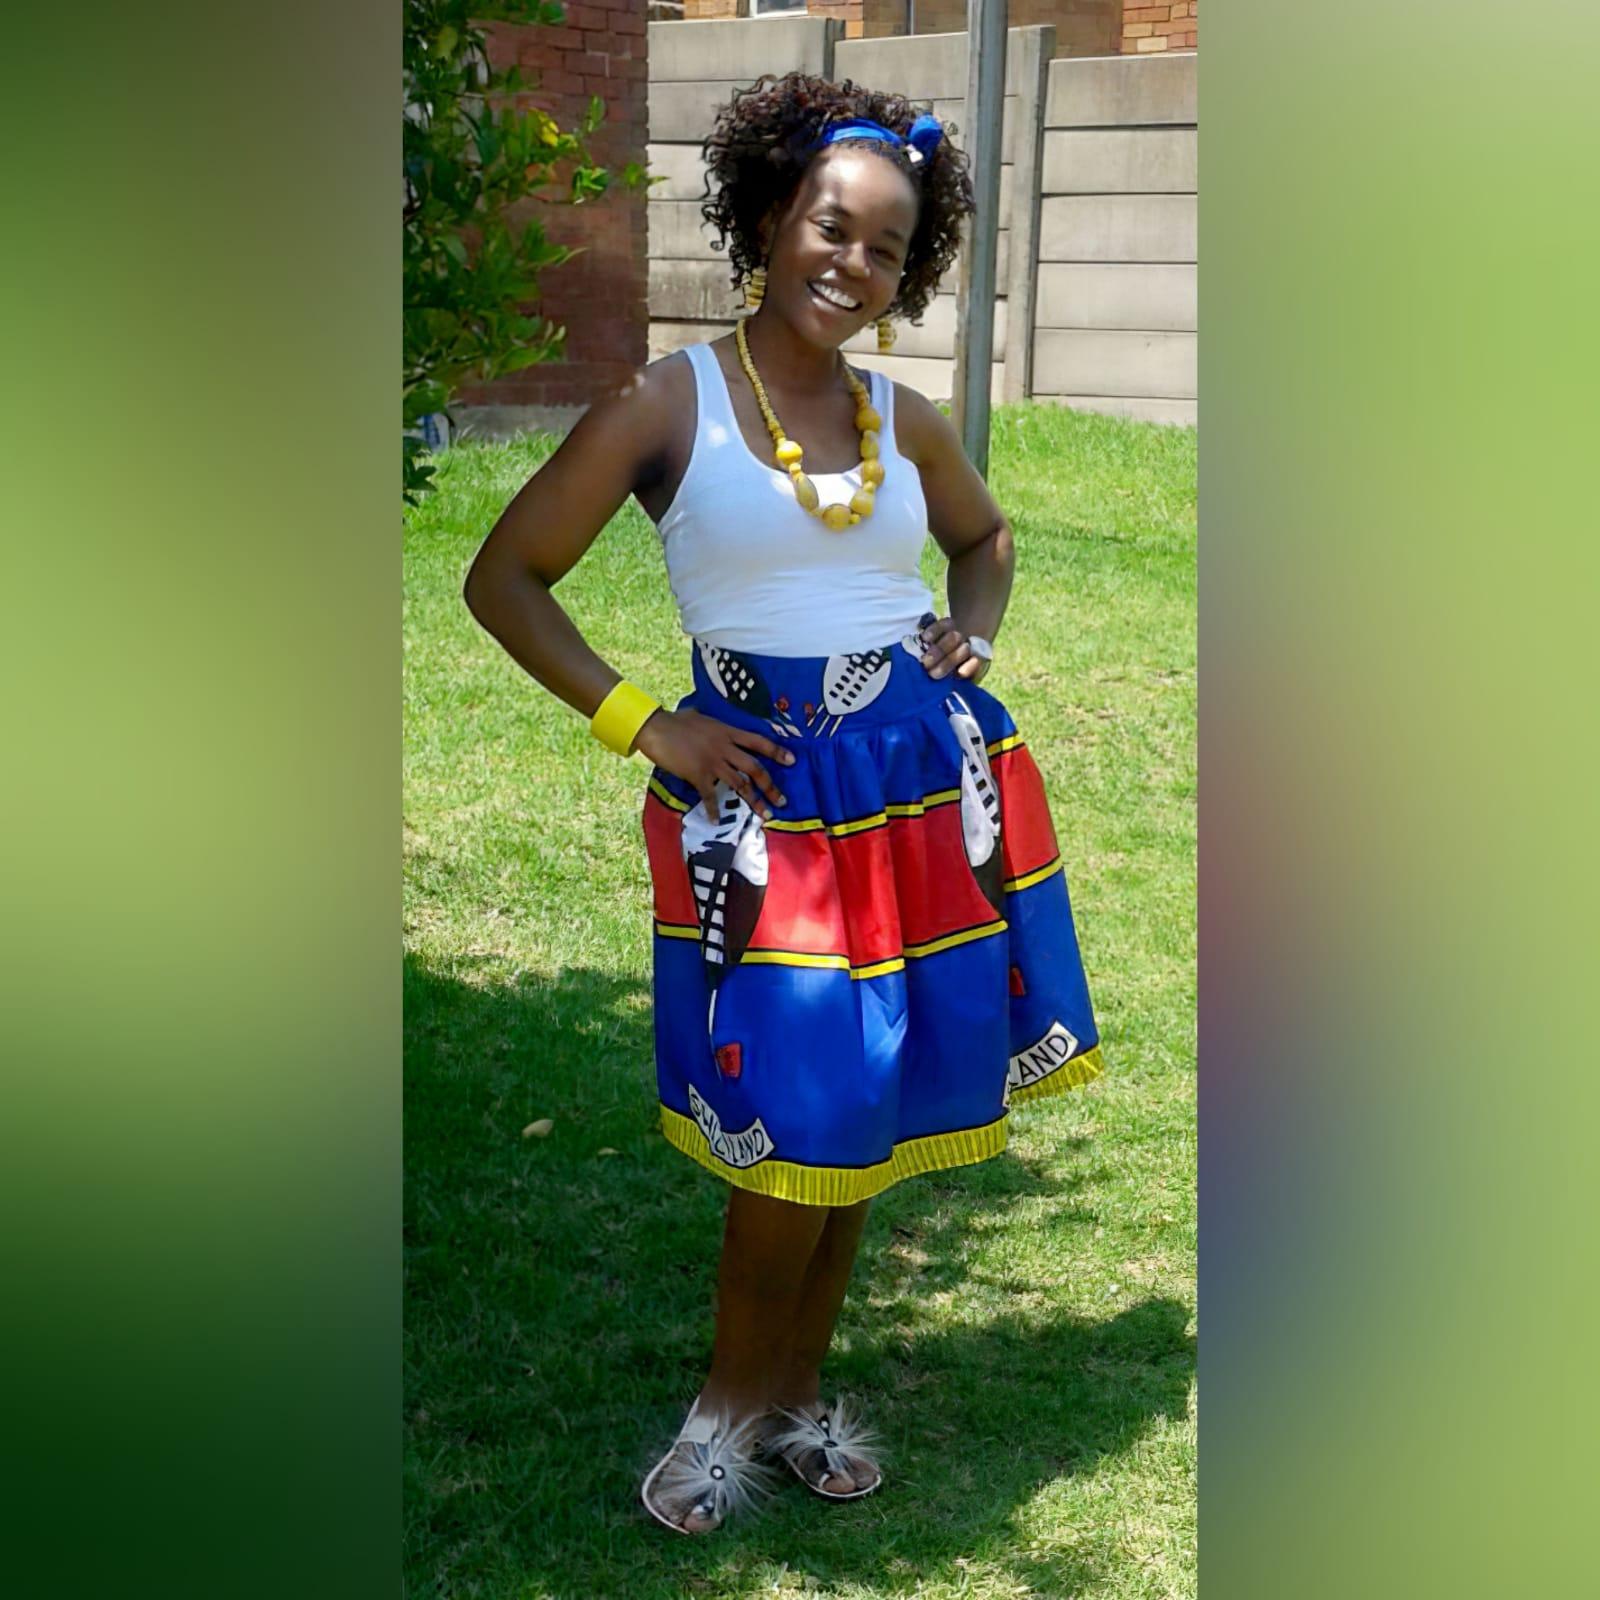 Swati traditional wedding attire 4 mens swazi/swati short sleeve shirt. High waisted swazi/swati skirt. High waisted pleated swazi/swati skirt with crossed shoulder straps. One sleeve little girls swazi/swati dress with shoulder strap. Traditional wedding attire